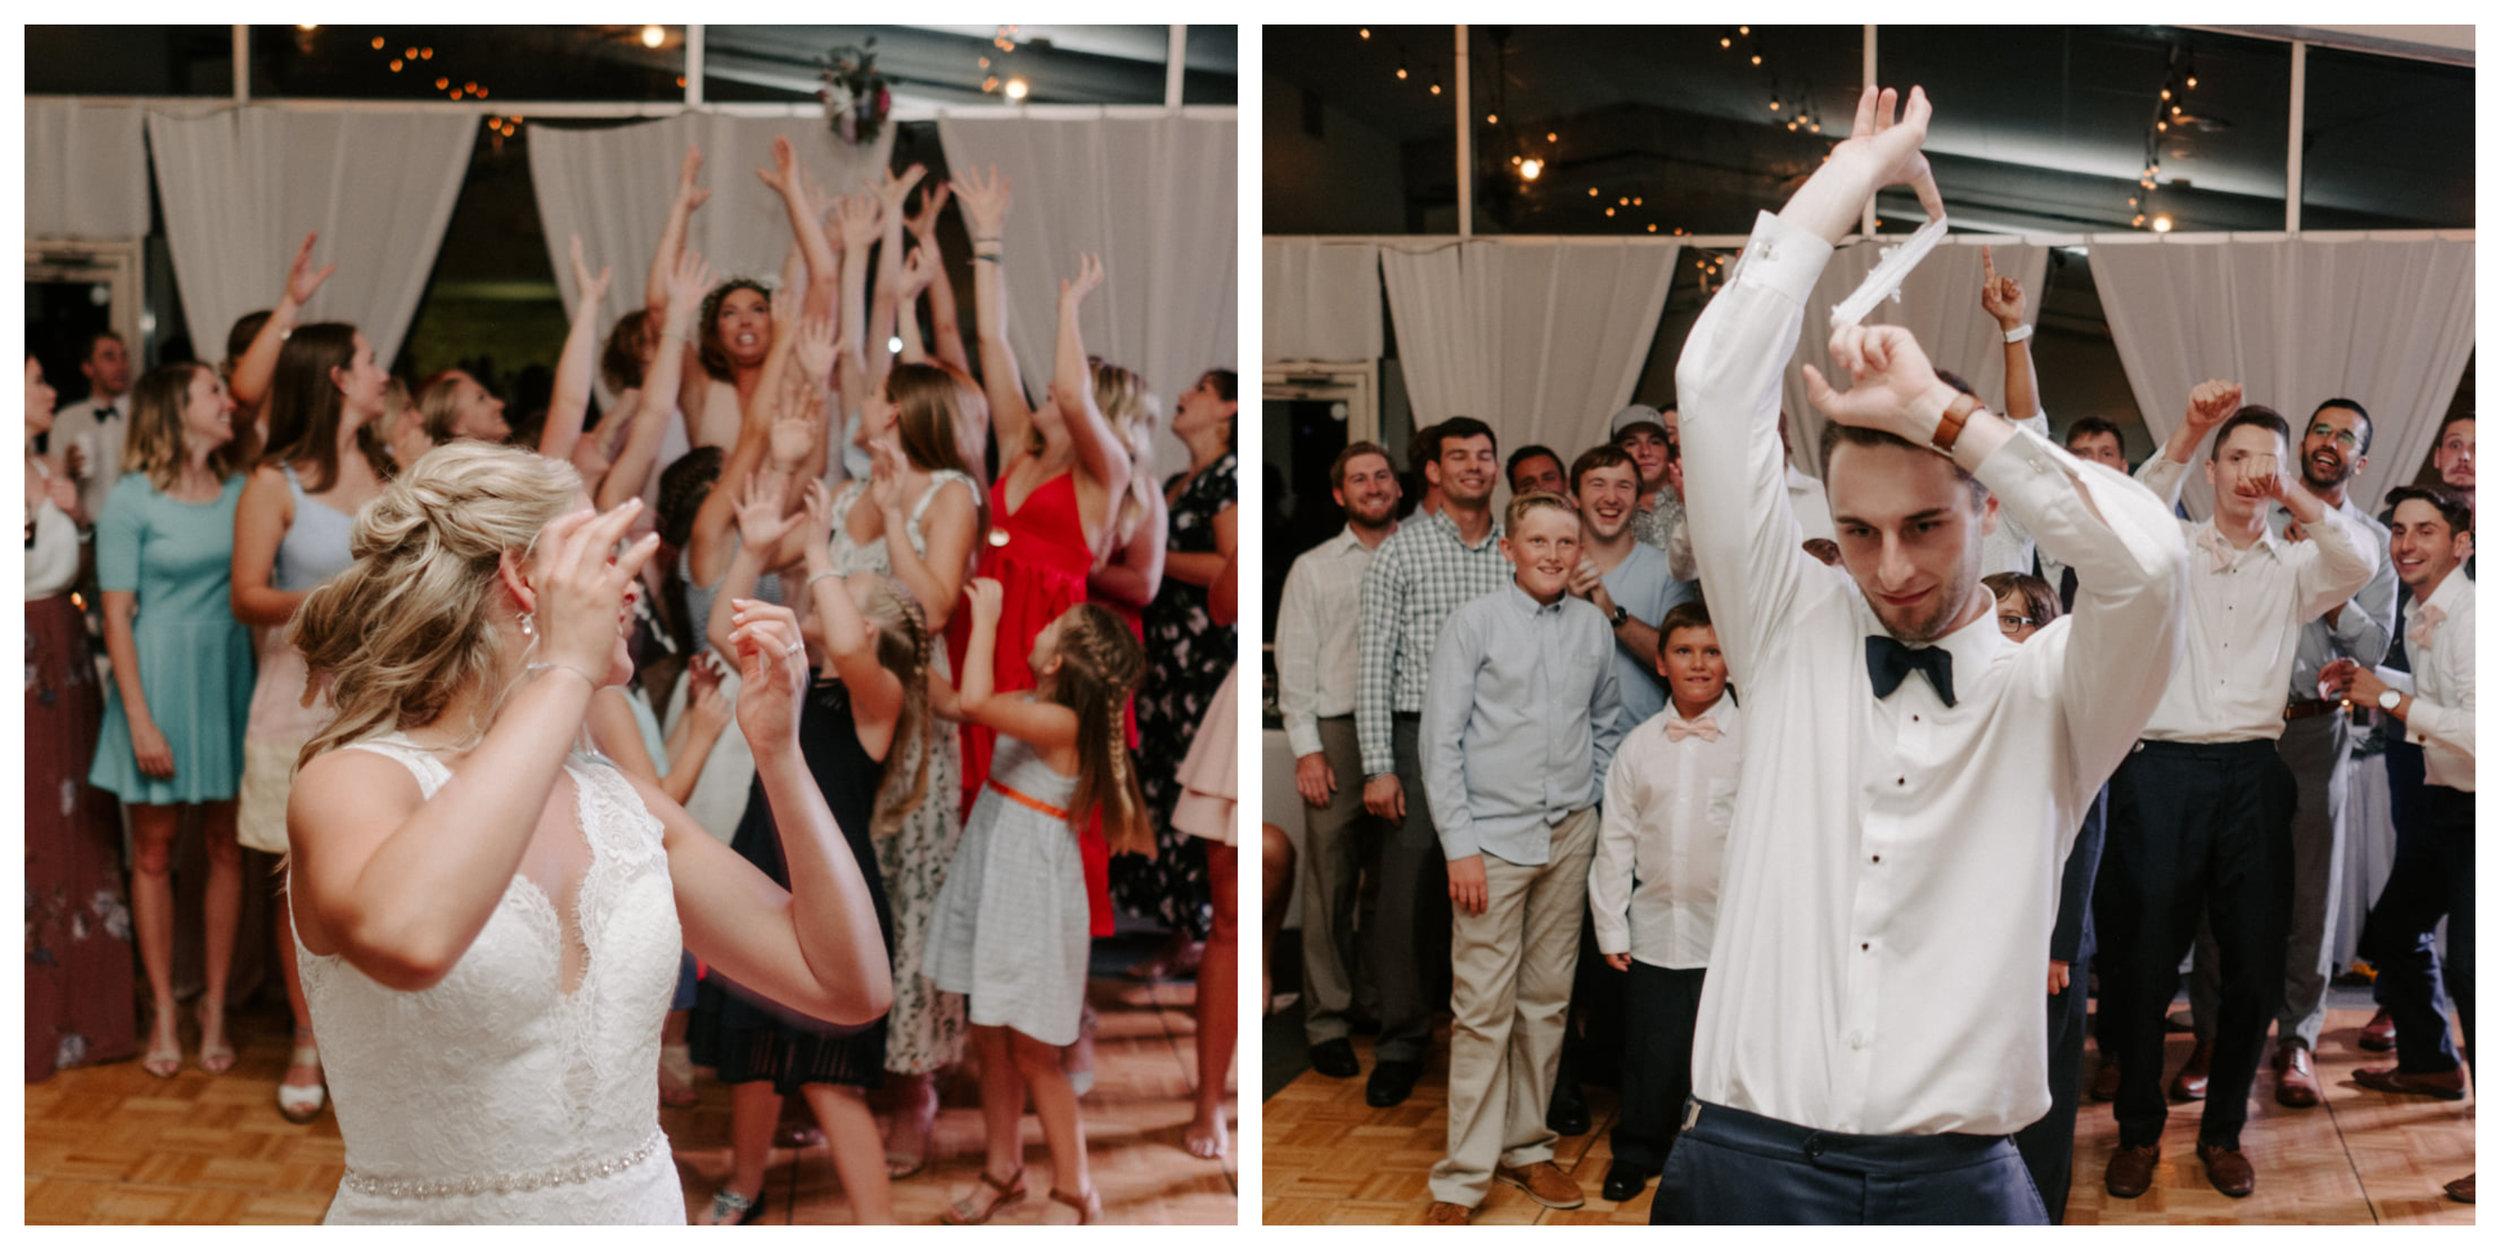 Webster Wedding Blog - Kansas City Bride30